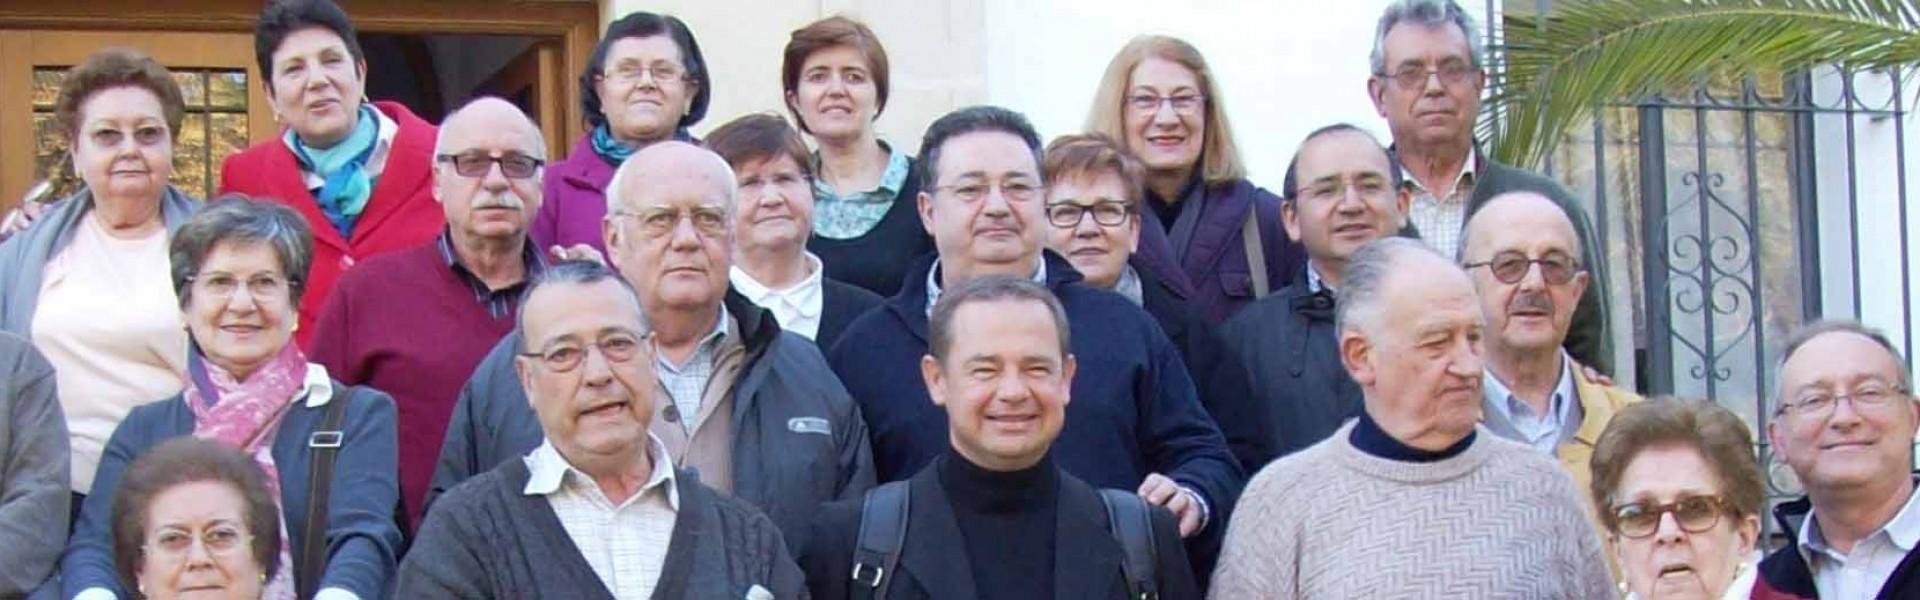 Hermandades del Trabajo Córdoba